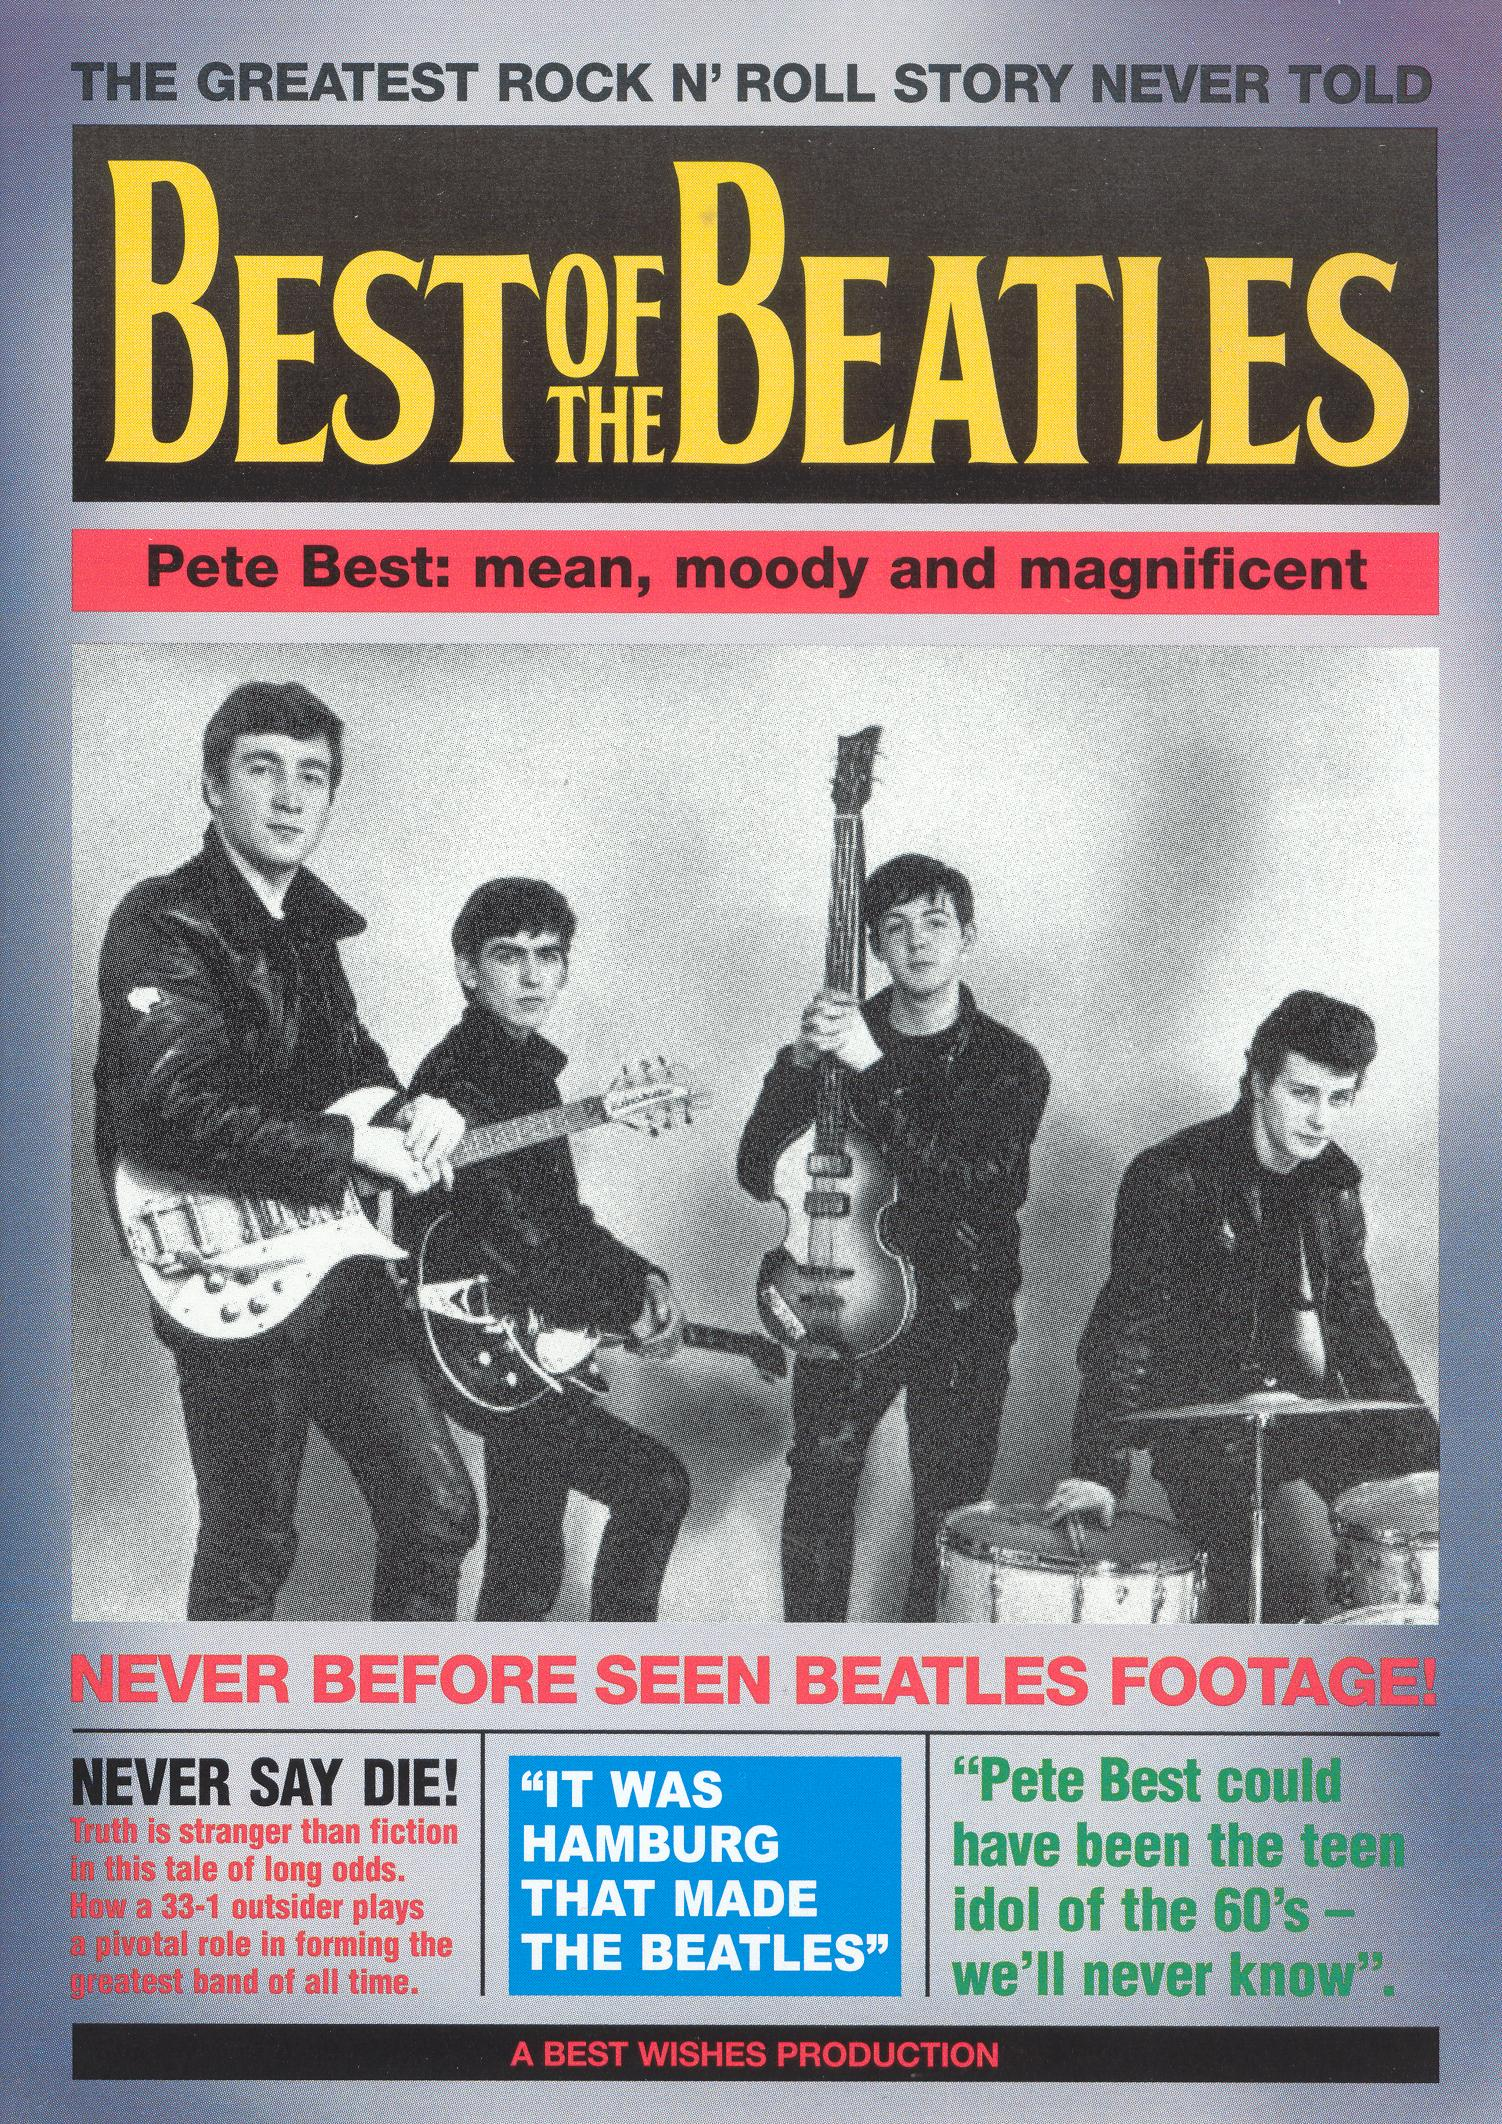 Pete Best: Best of the Beatles